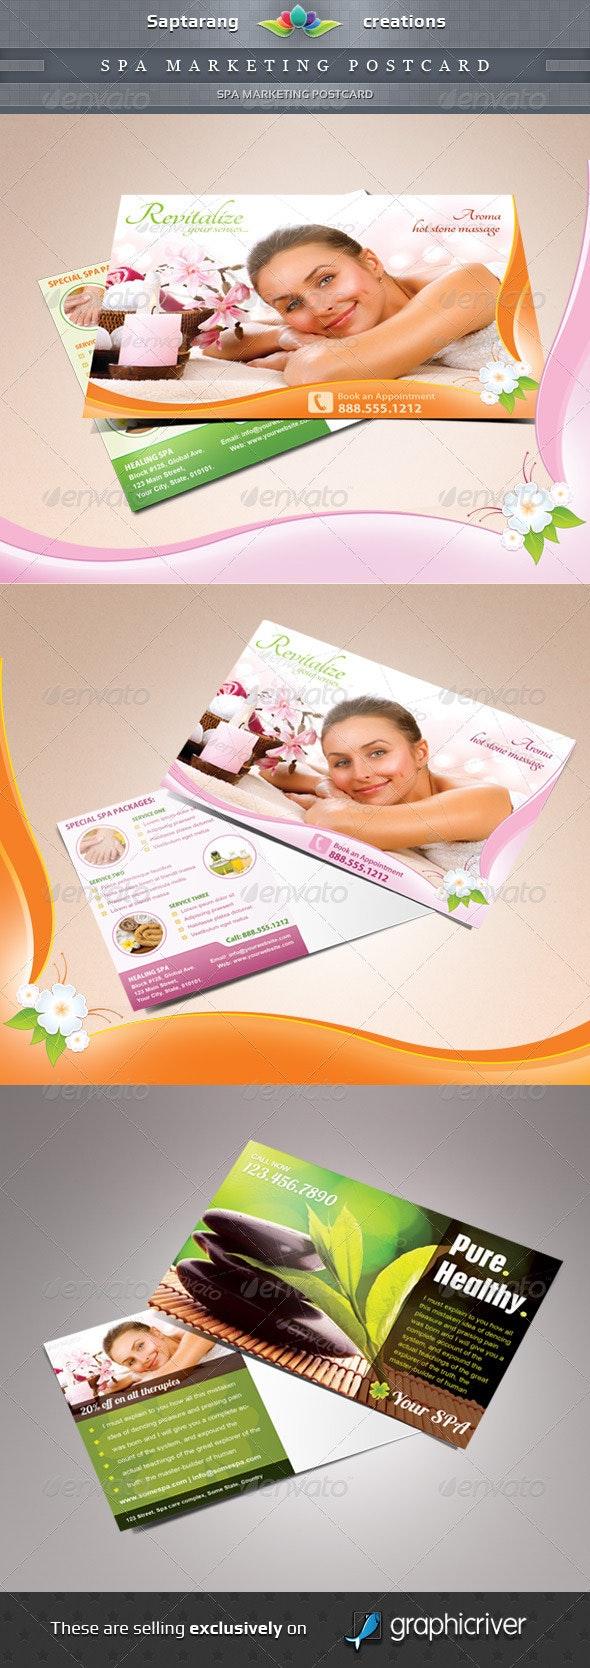 Spa Marketing Postcard Template - Stationery Print Templates